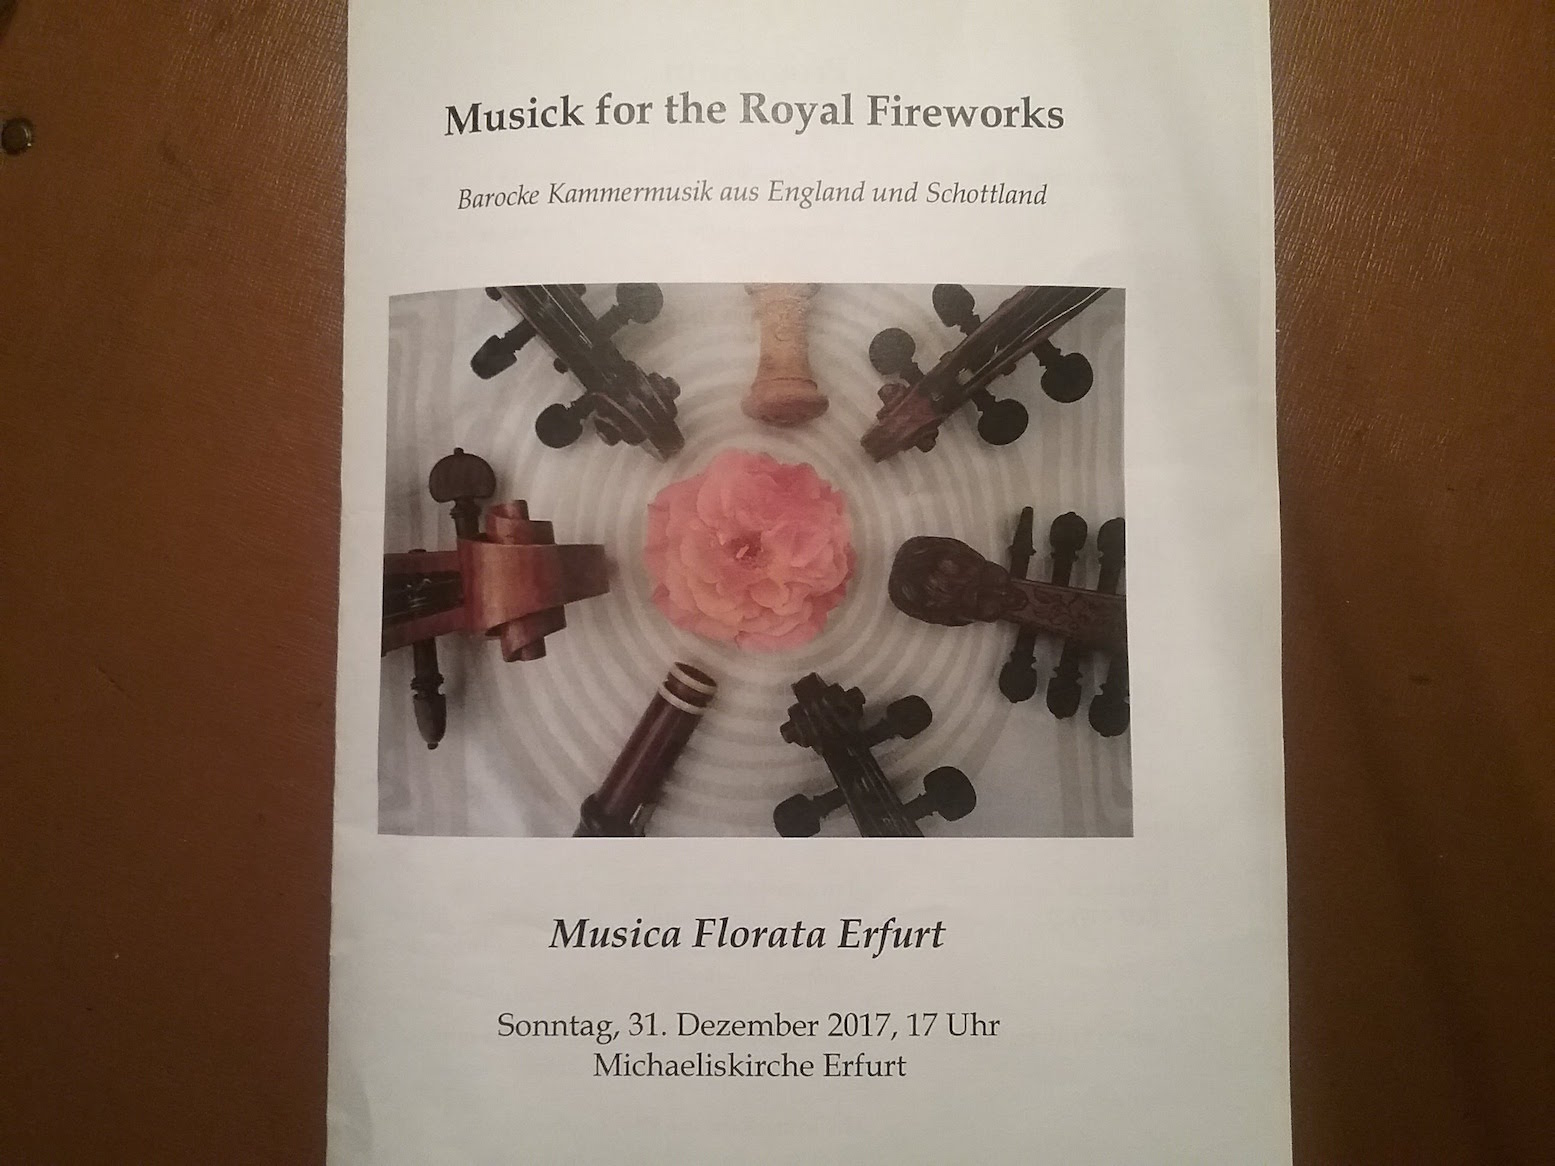 2017.12.31. musica florata erfurt 1 Michaeliskirche